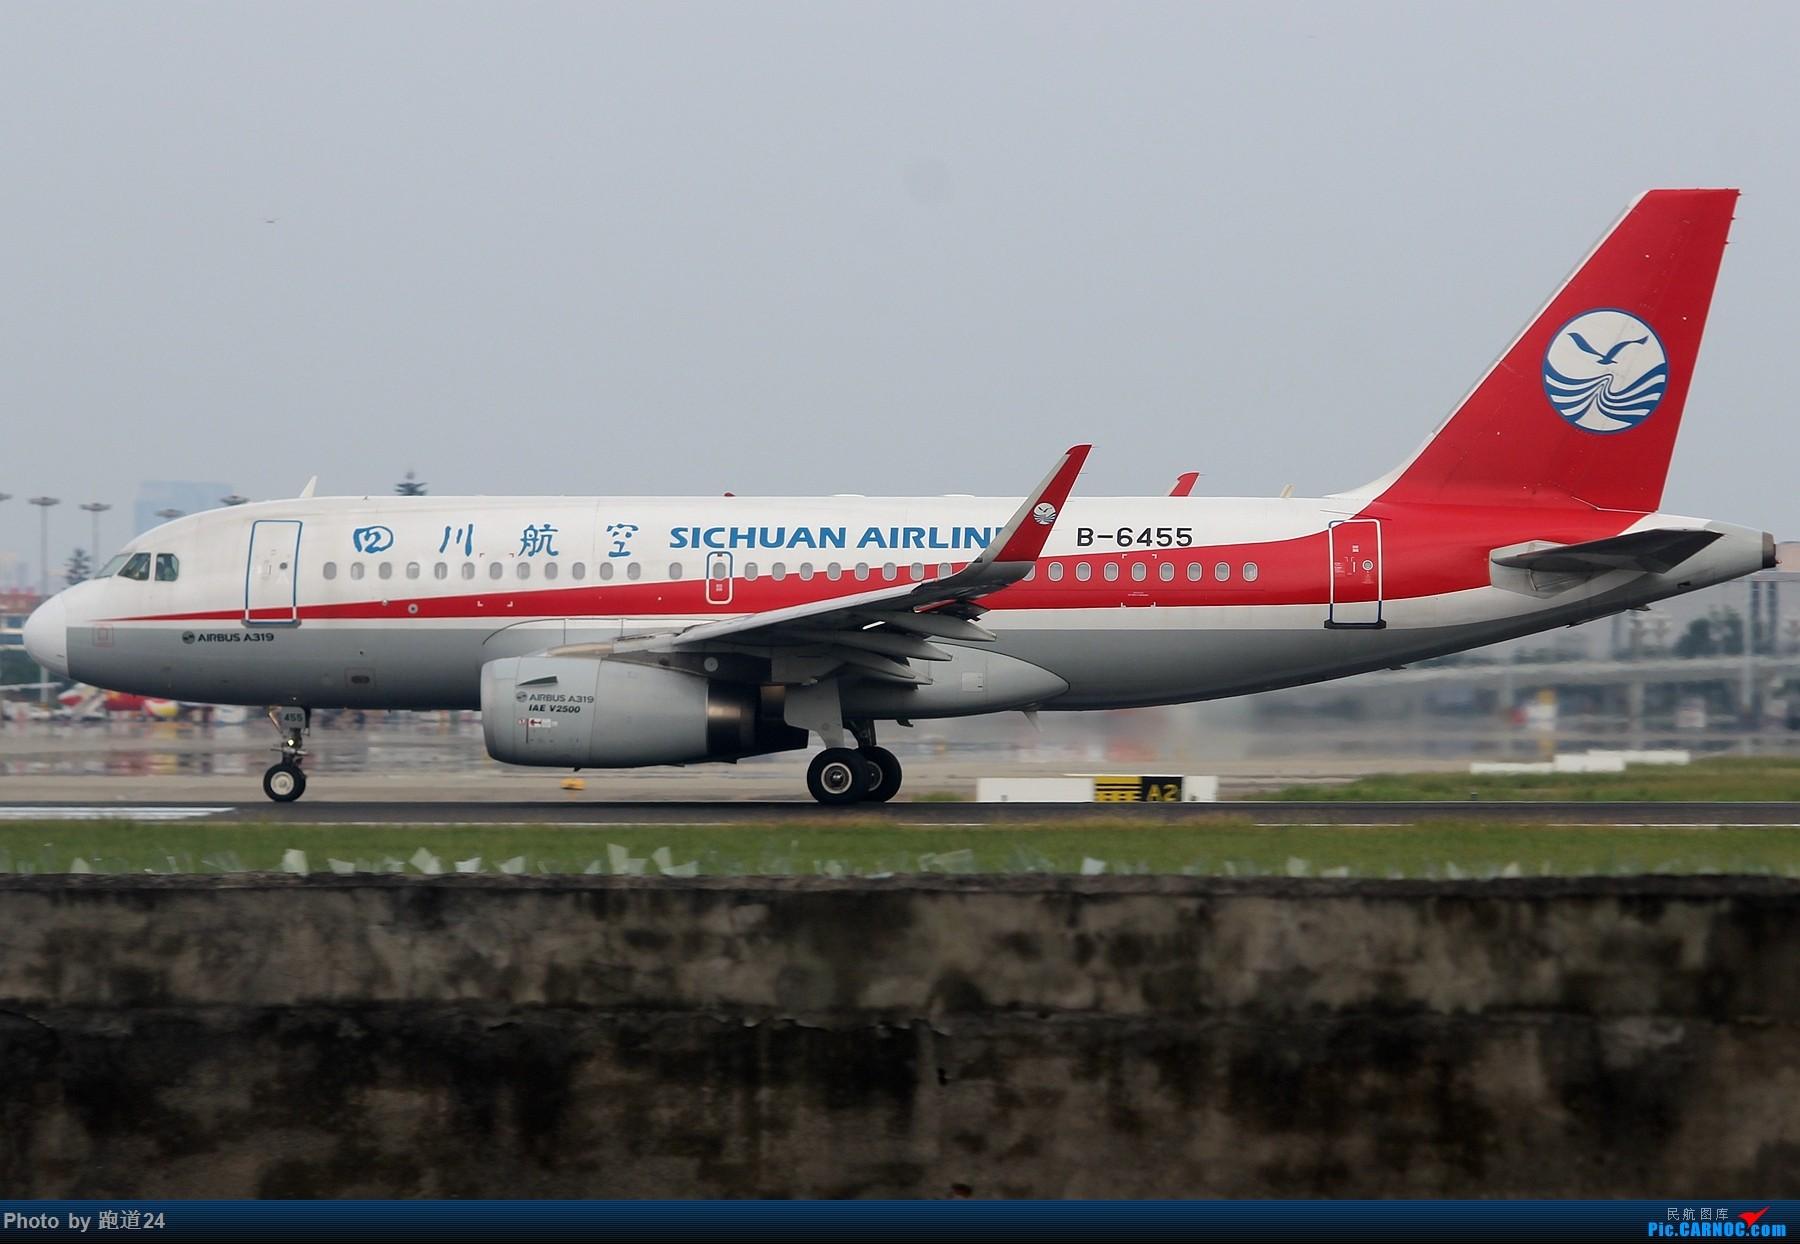 Re:[原创]【多图党】9.16CTU拍机 1800*1200 AIRBUS A319-100 B-6455 中国成都双流国际机场